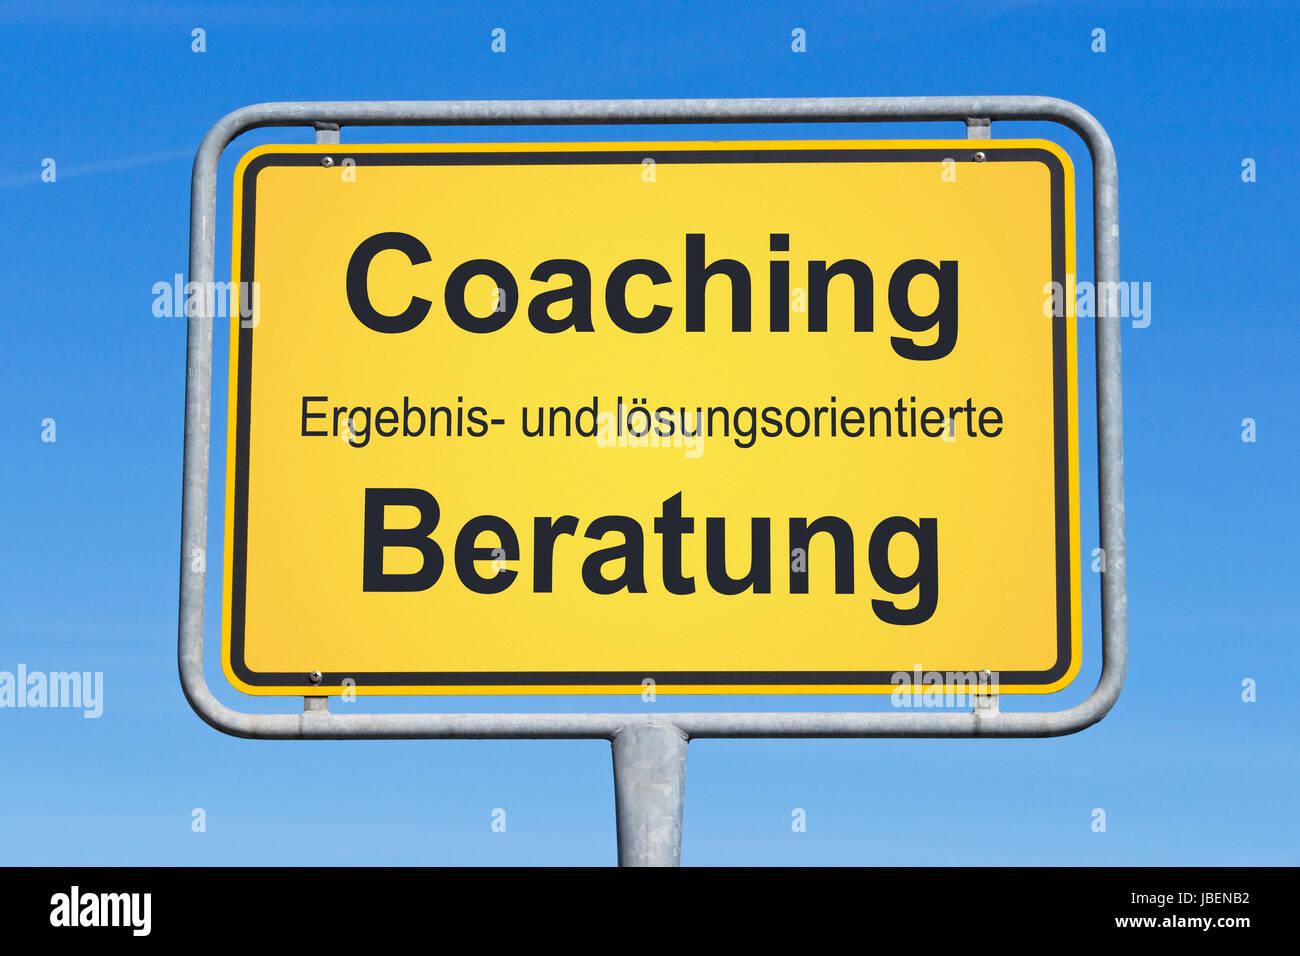 Coaching Stock Photo